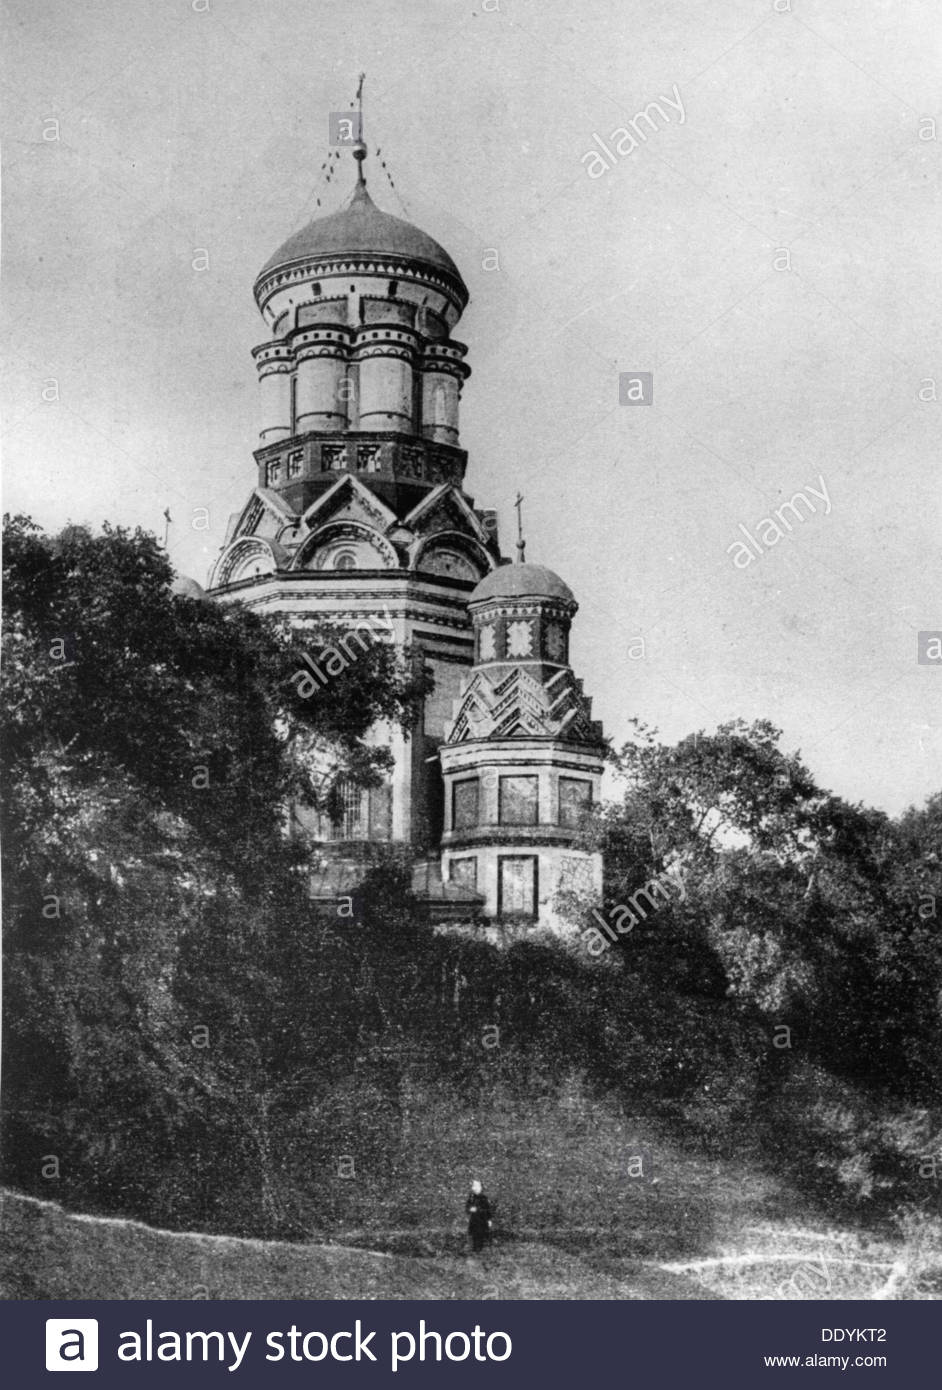 The Church of St John the Baptist, Diakovo, Russia, c1900-c1905. - Stock Image